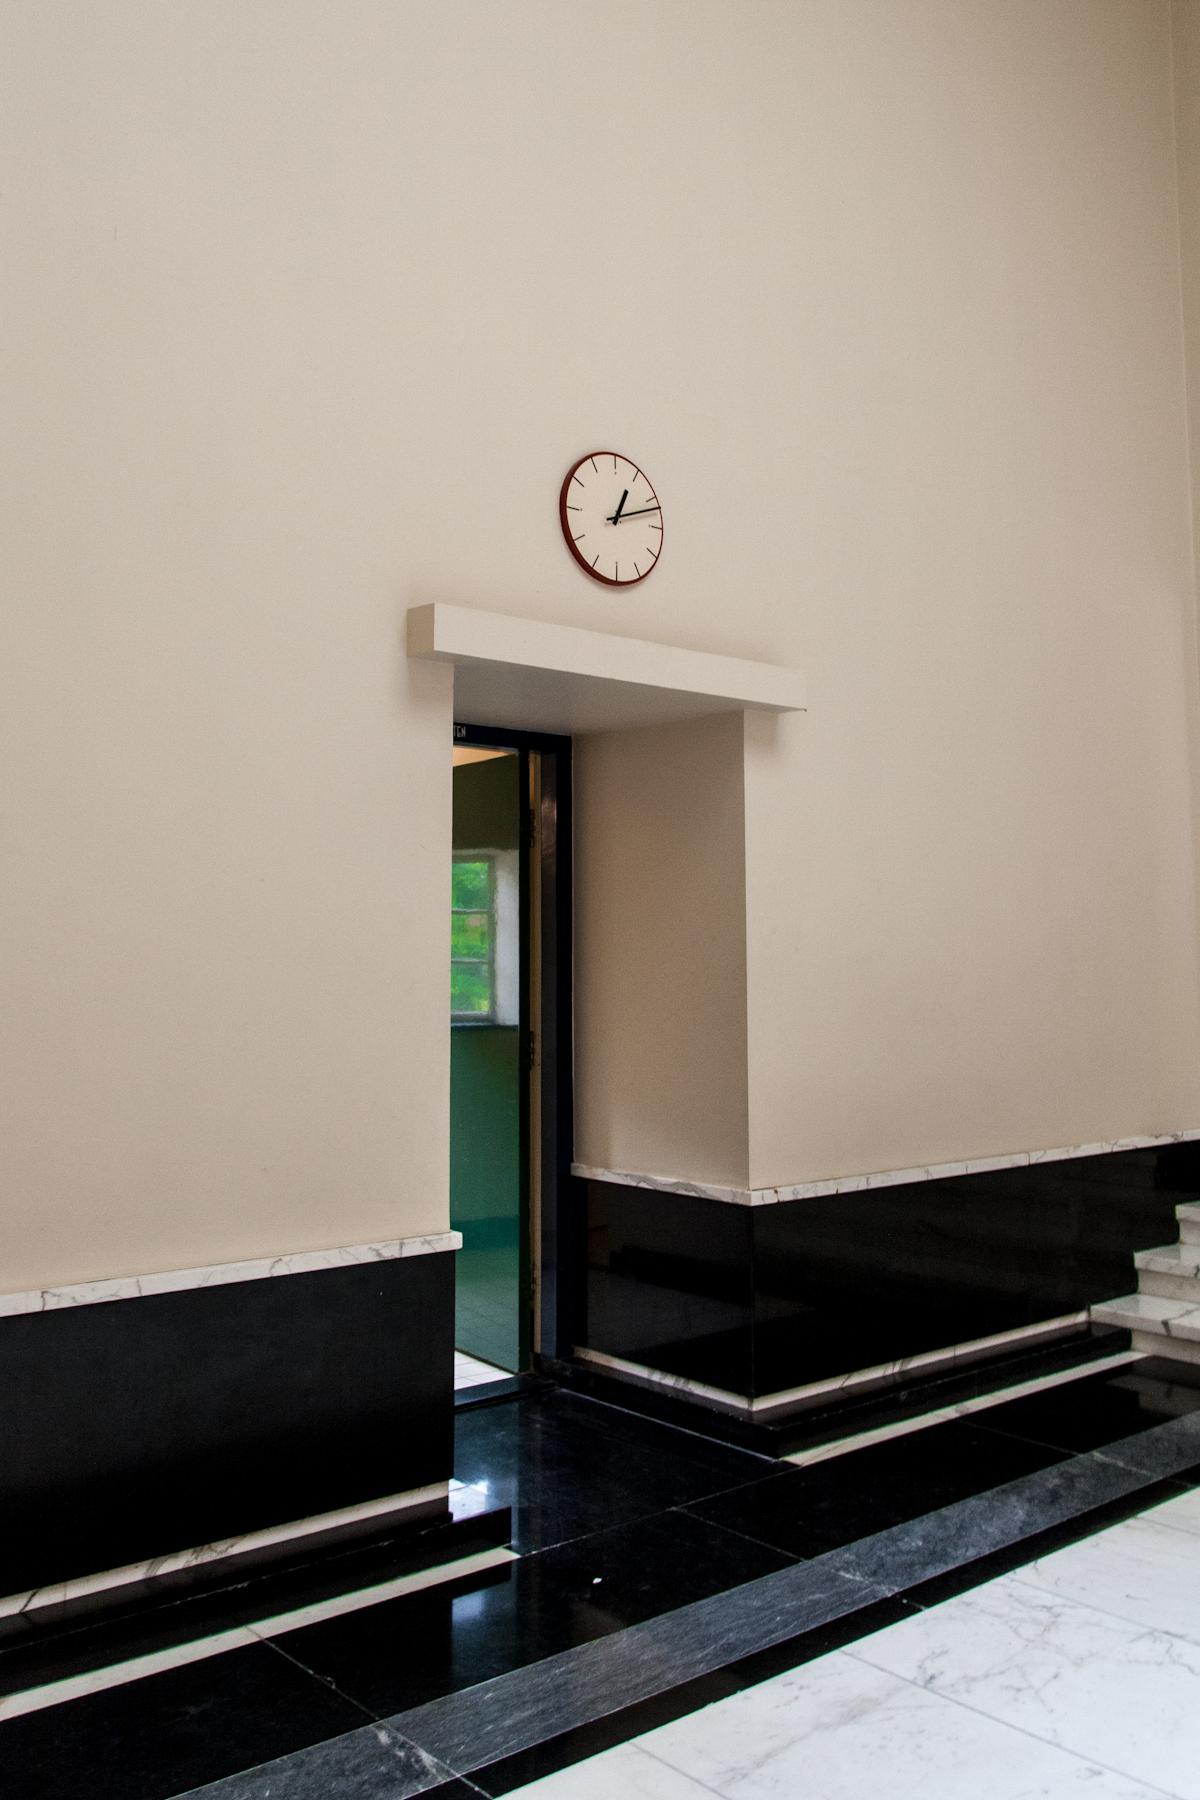 File:Dudok Raadhuis Hilversum interieur detail-03.jpg - Wikimedia ...